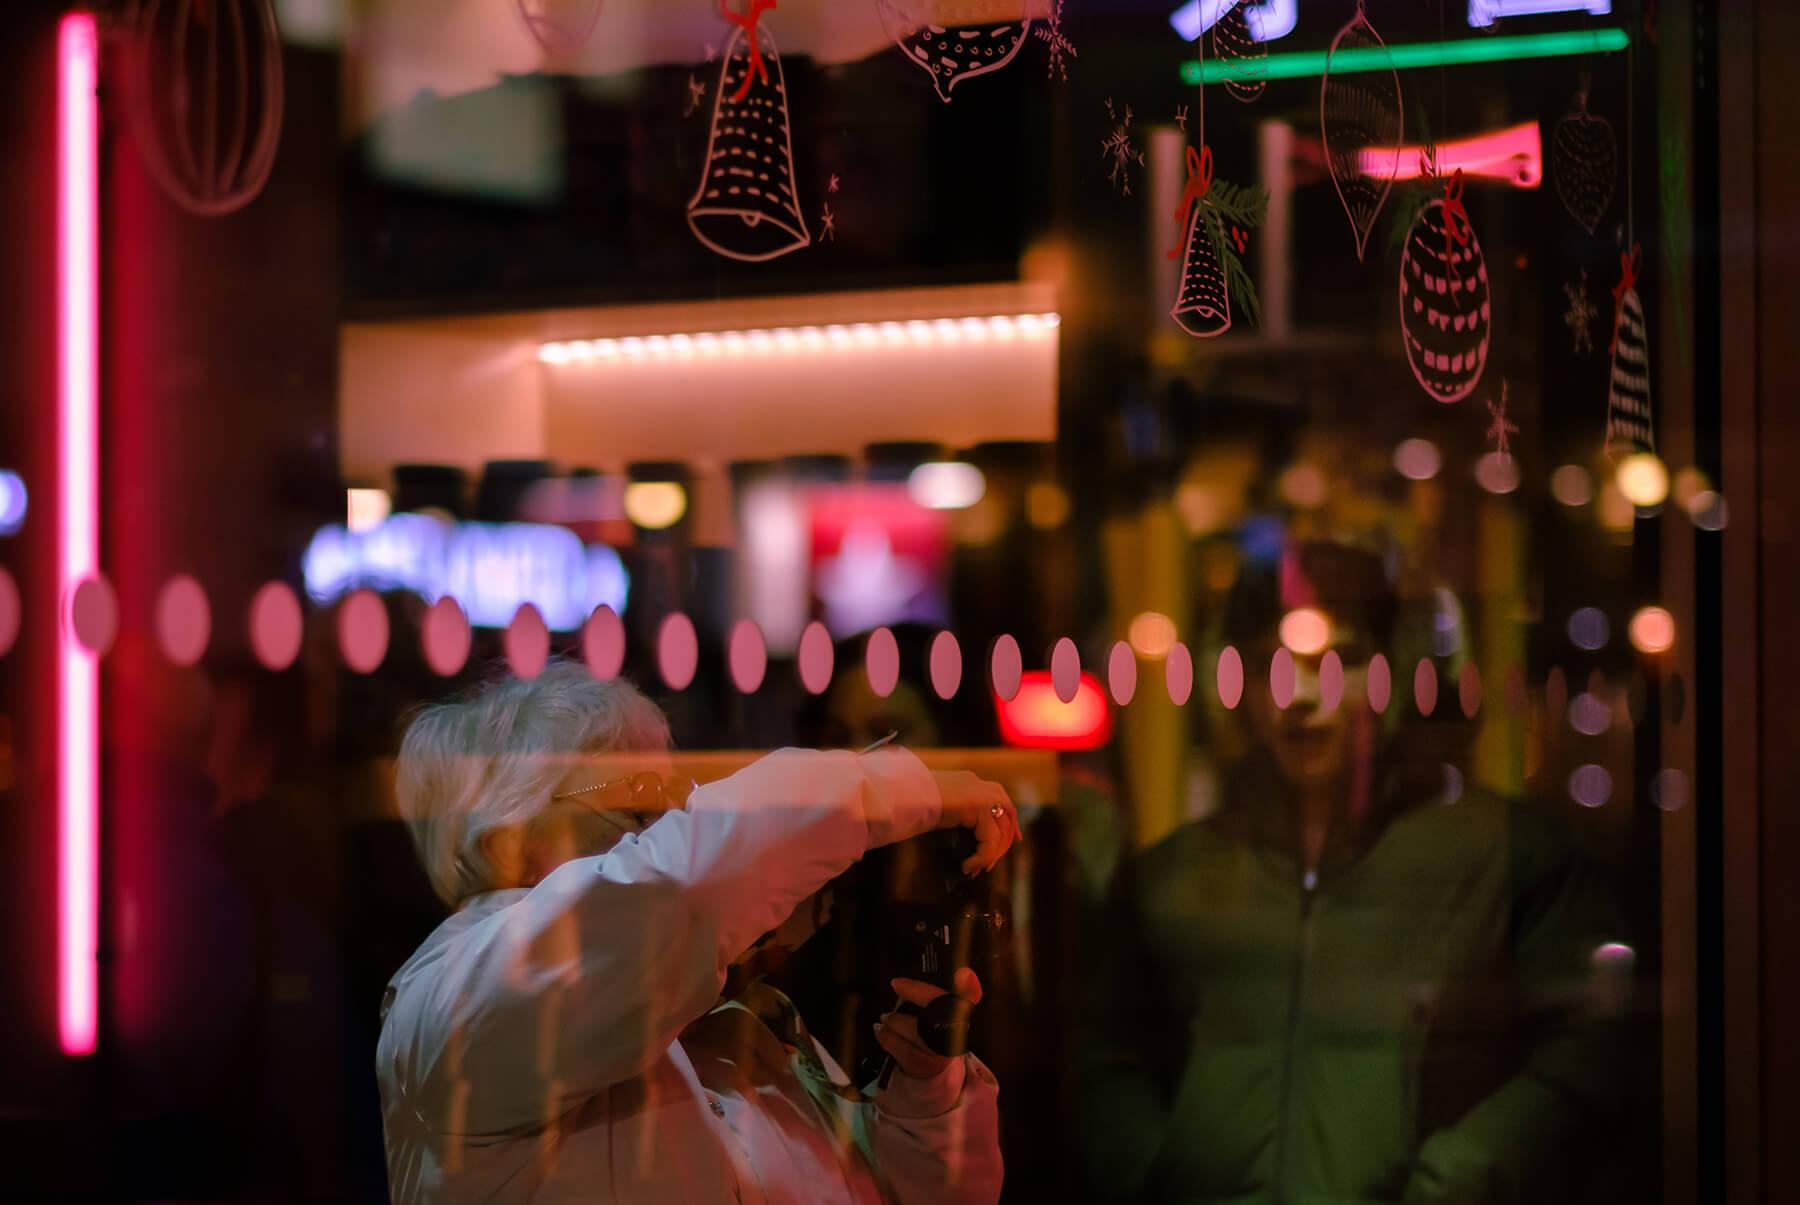 Street photography taken on Fujifilm X-T4